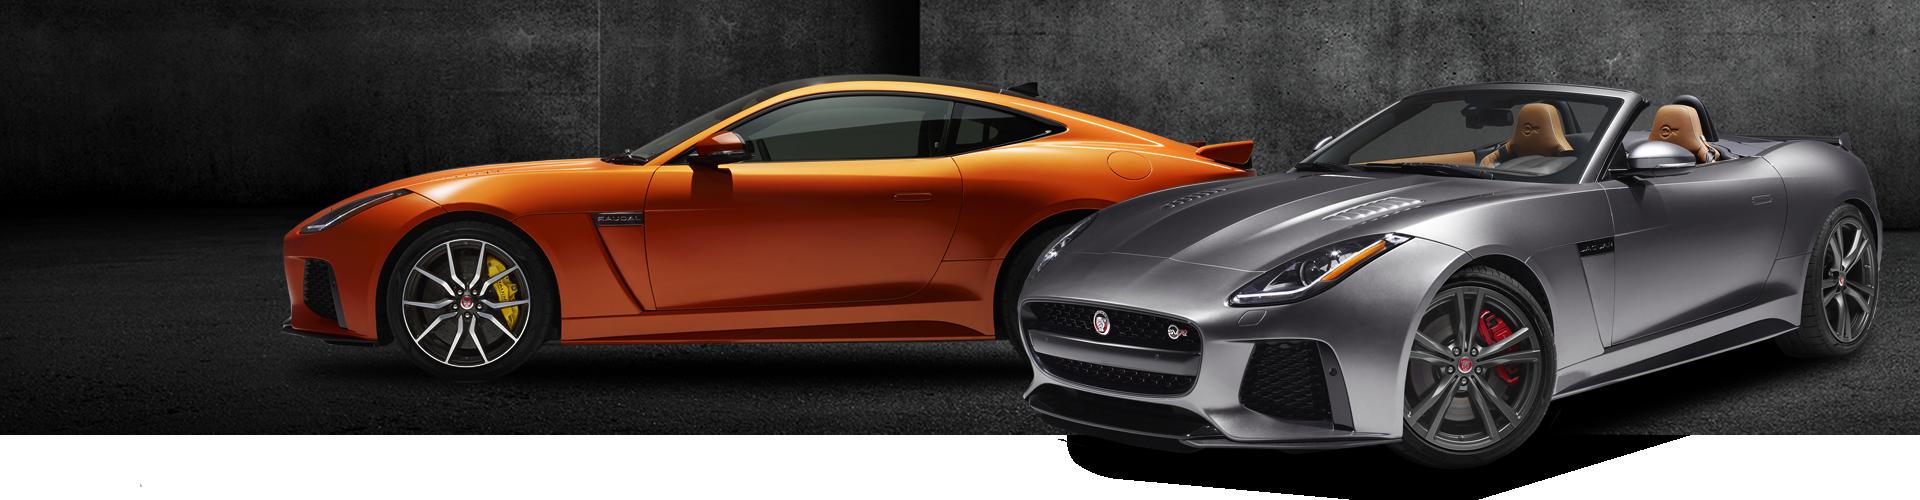 Rent A Jaguar F Type Svr Enterprise Rent A Car